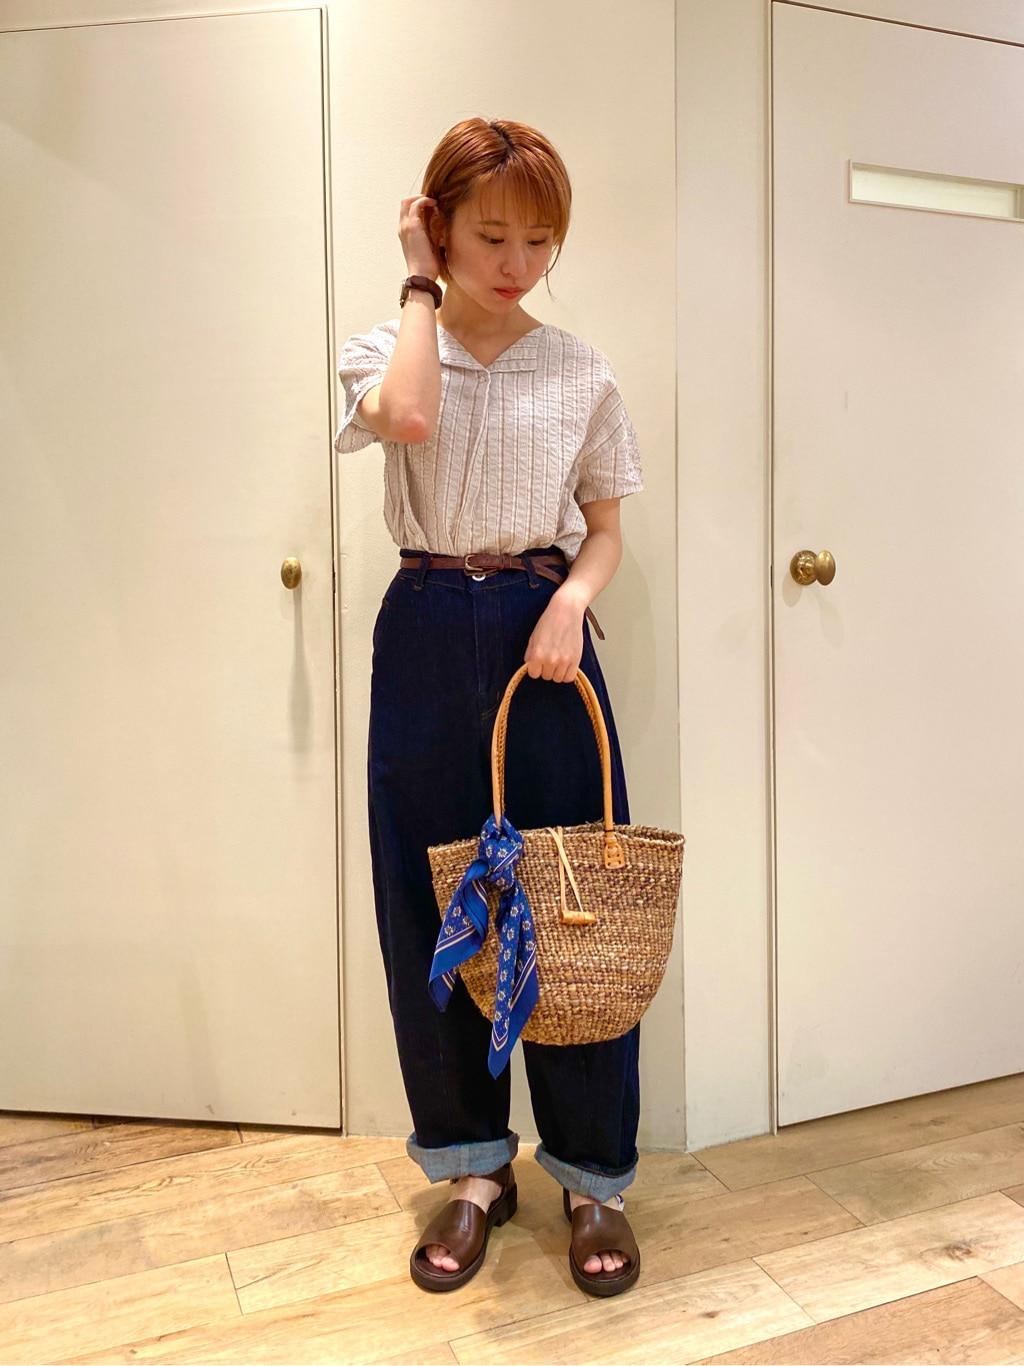 bulle de savon 新宿ミロード 身長:157cm 2020.07.21